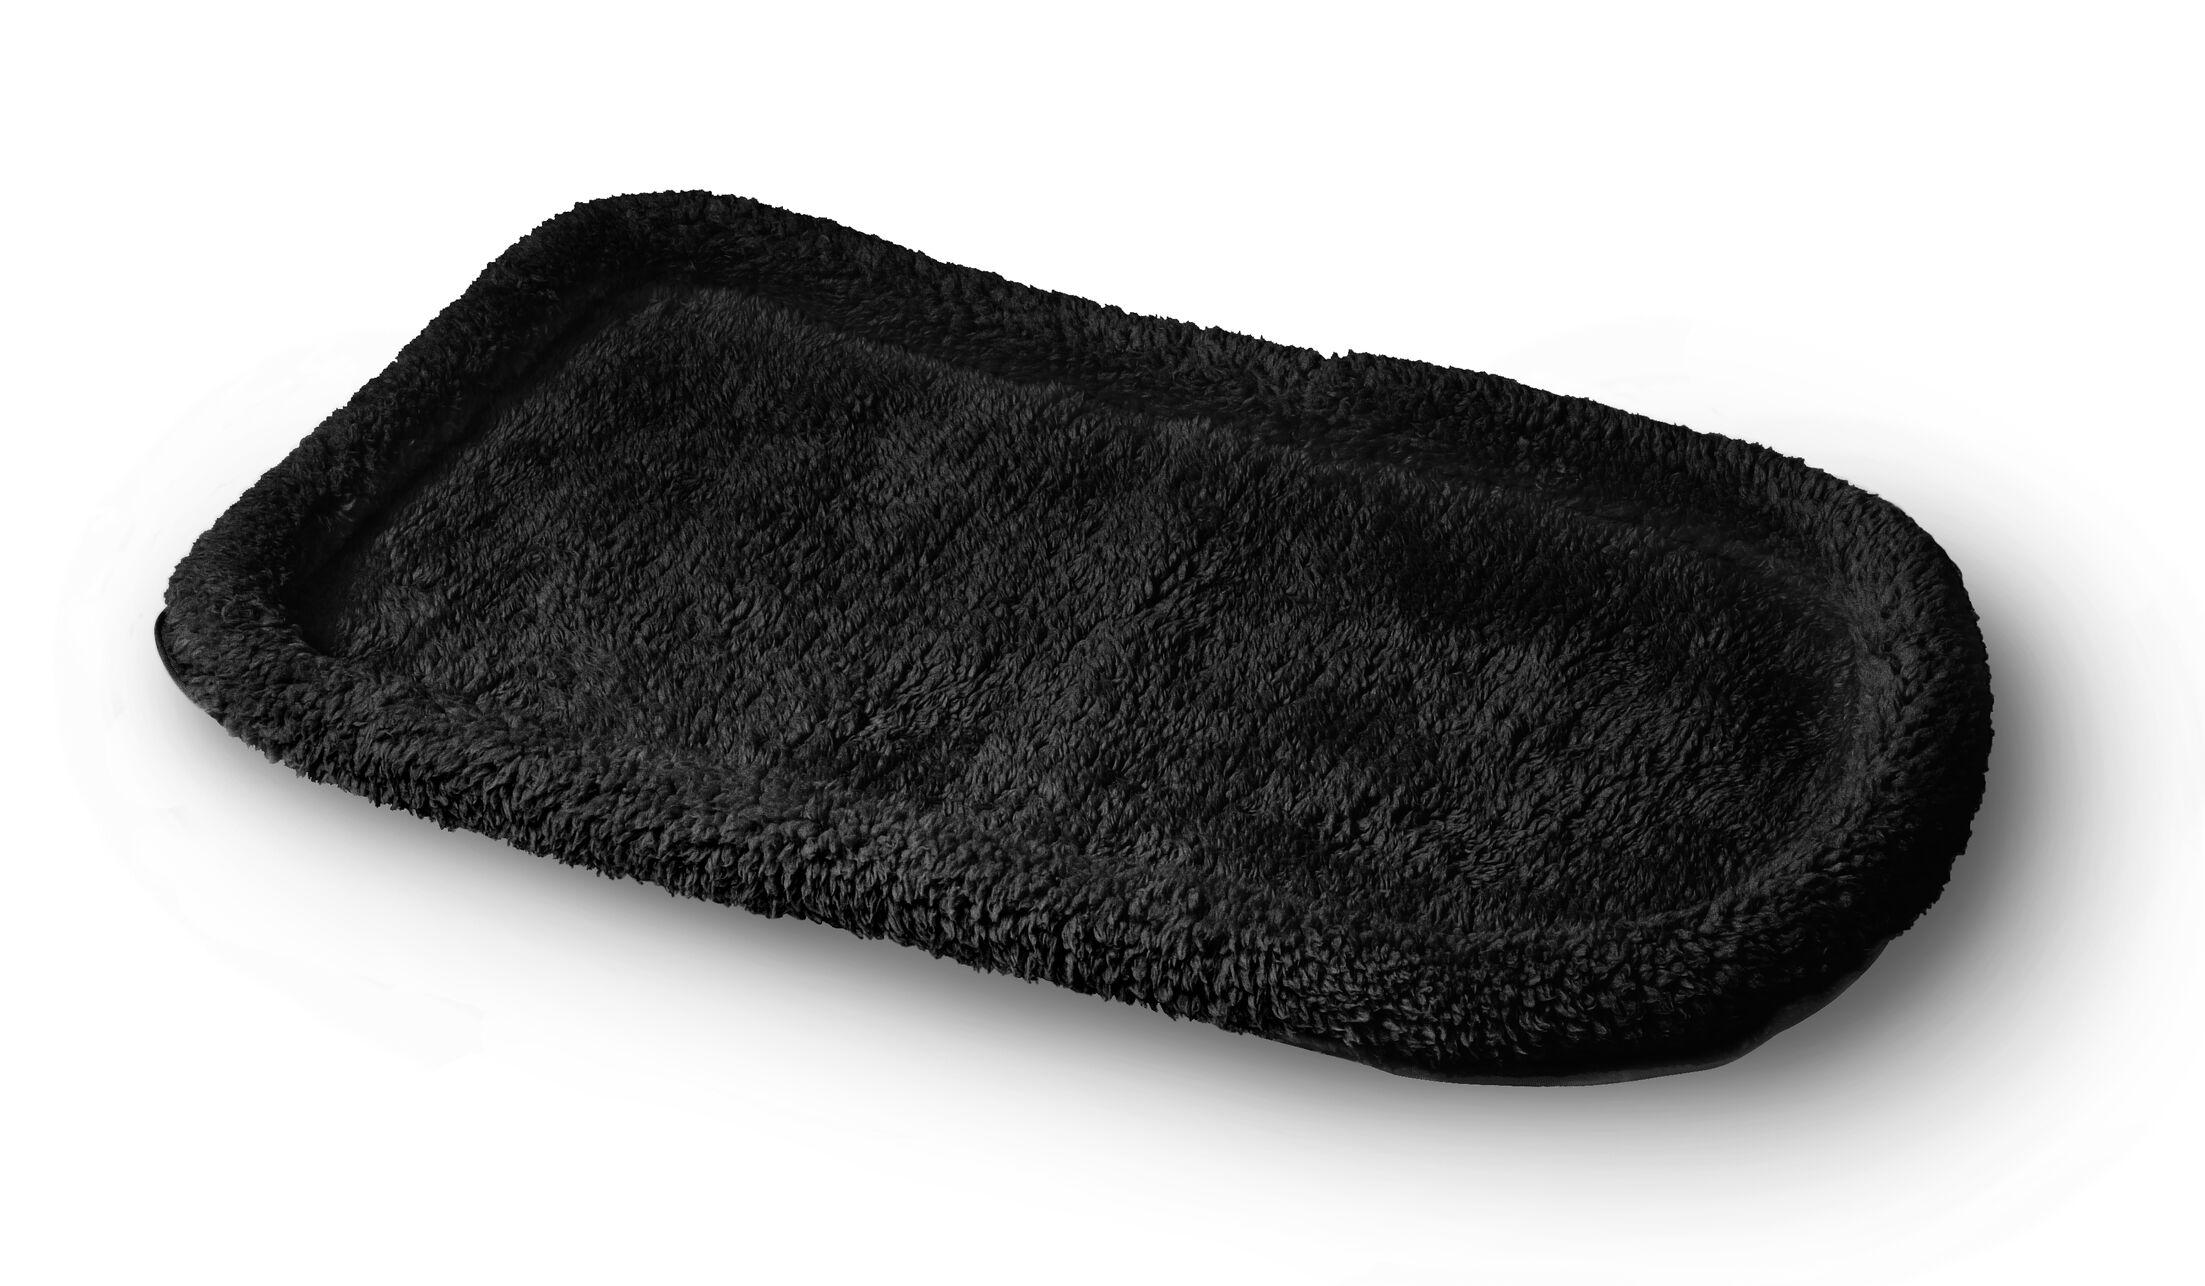 Smart-Comfort Pad Size: 11